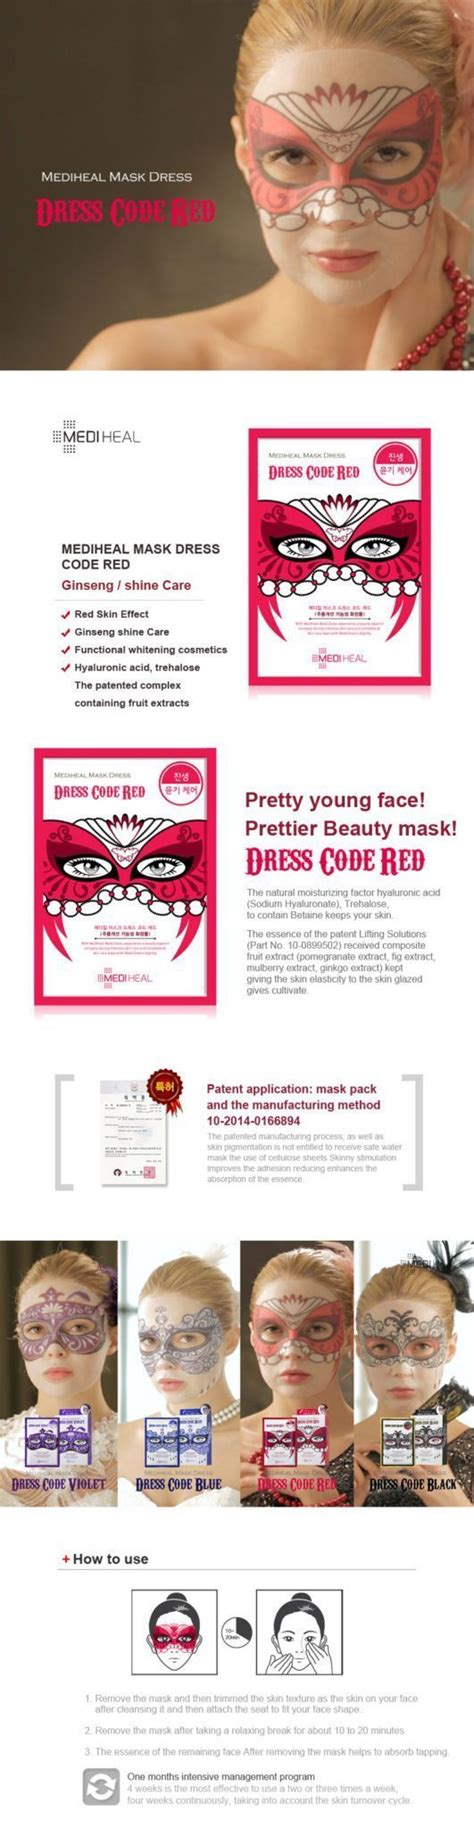 Mediheal Dress Code Mask Korea Masker Wajah Korea mediheal mask dress code brightening seoul next by you malaysia